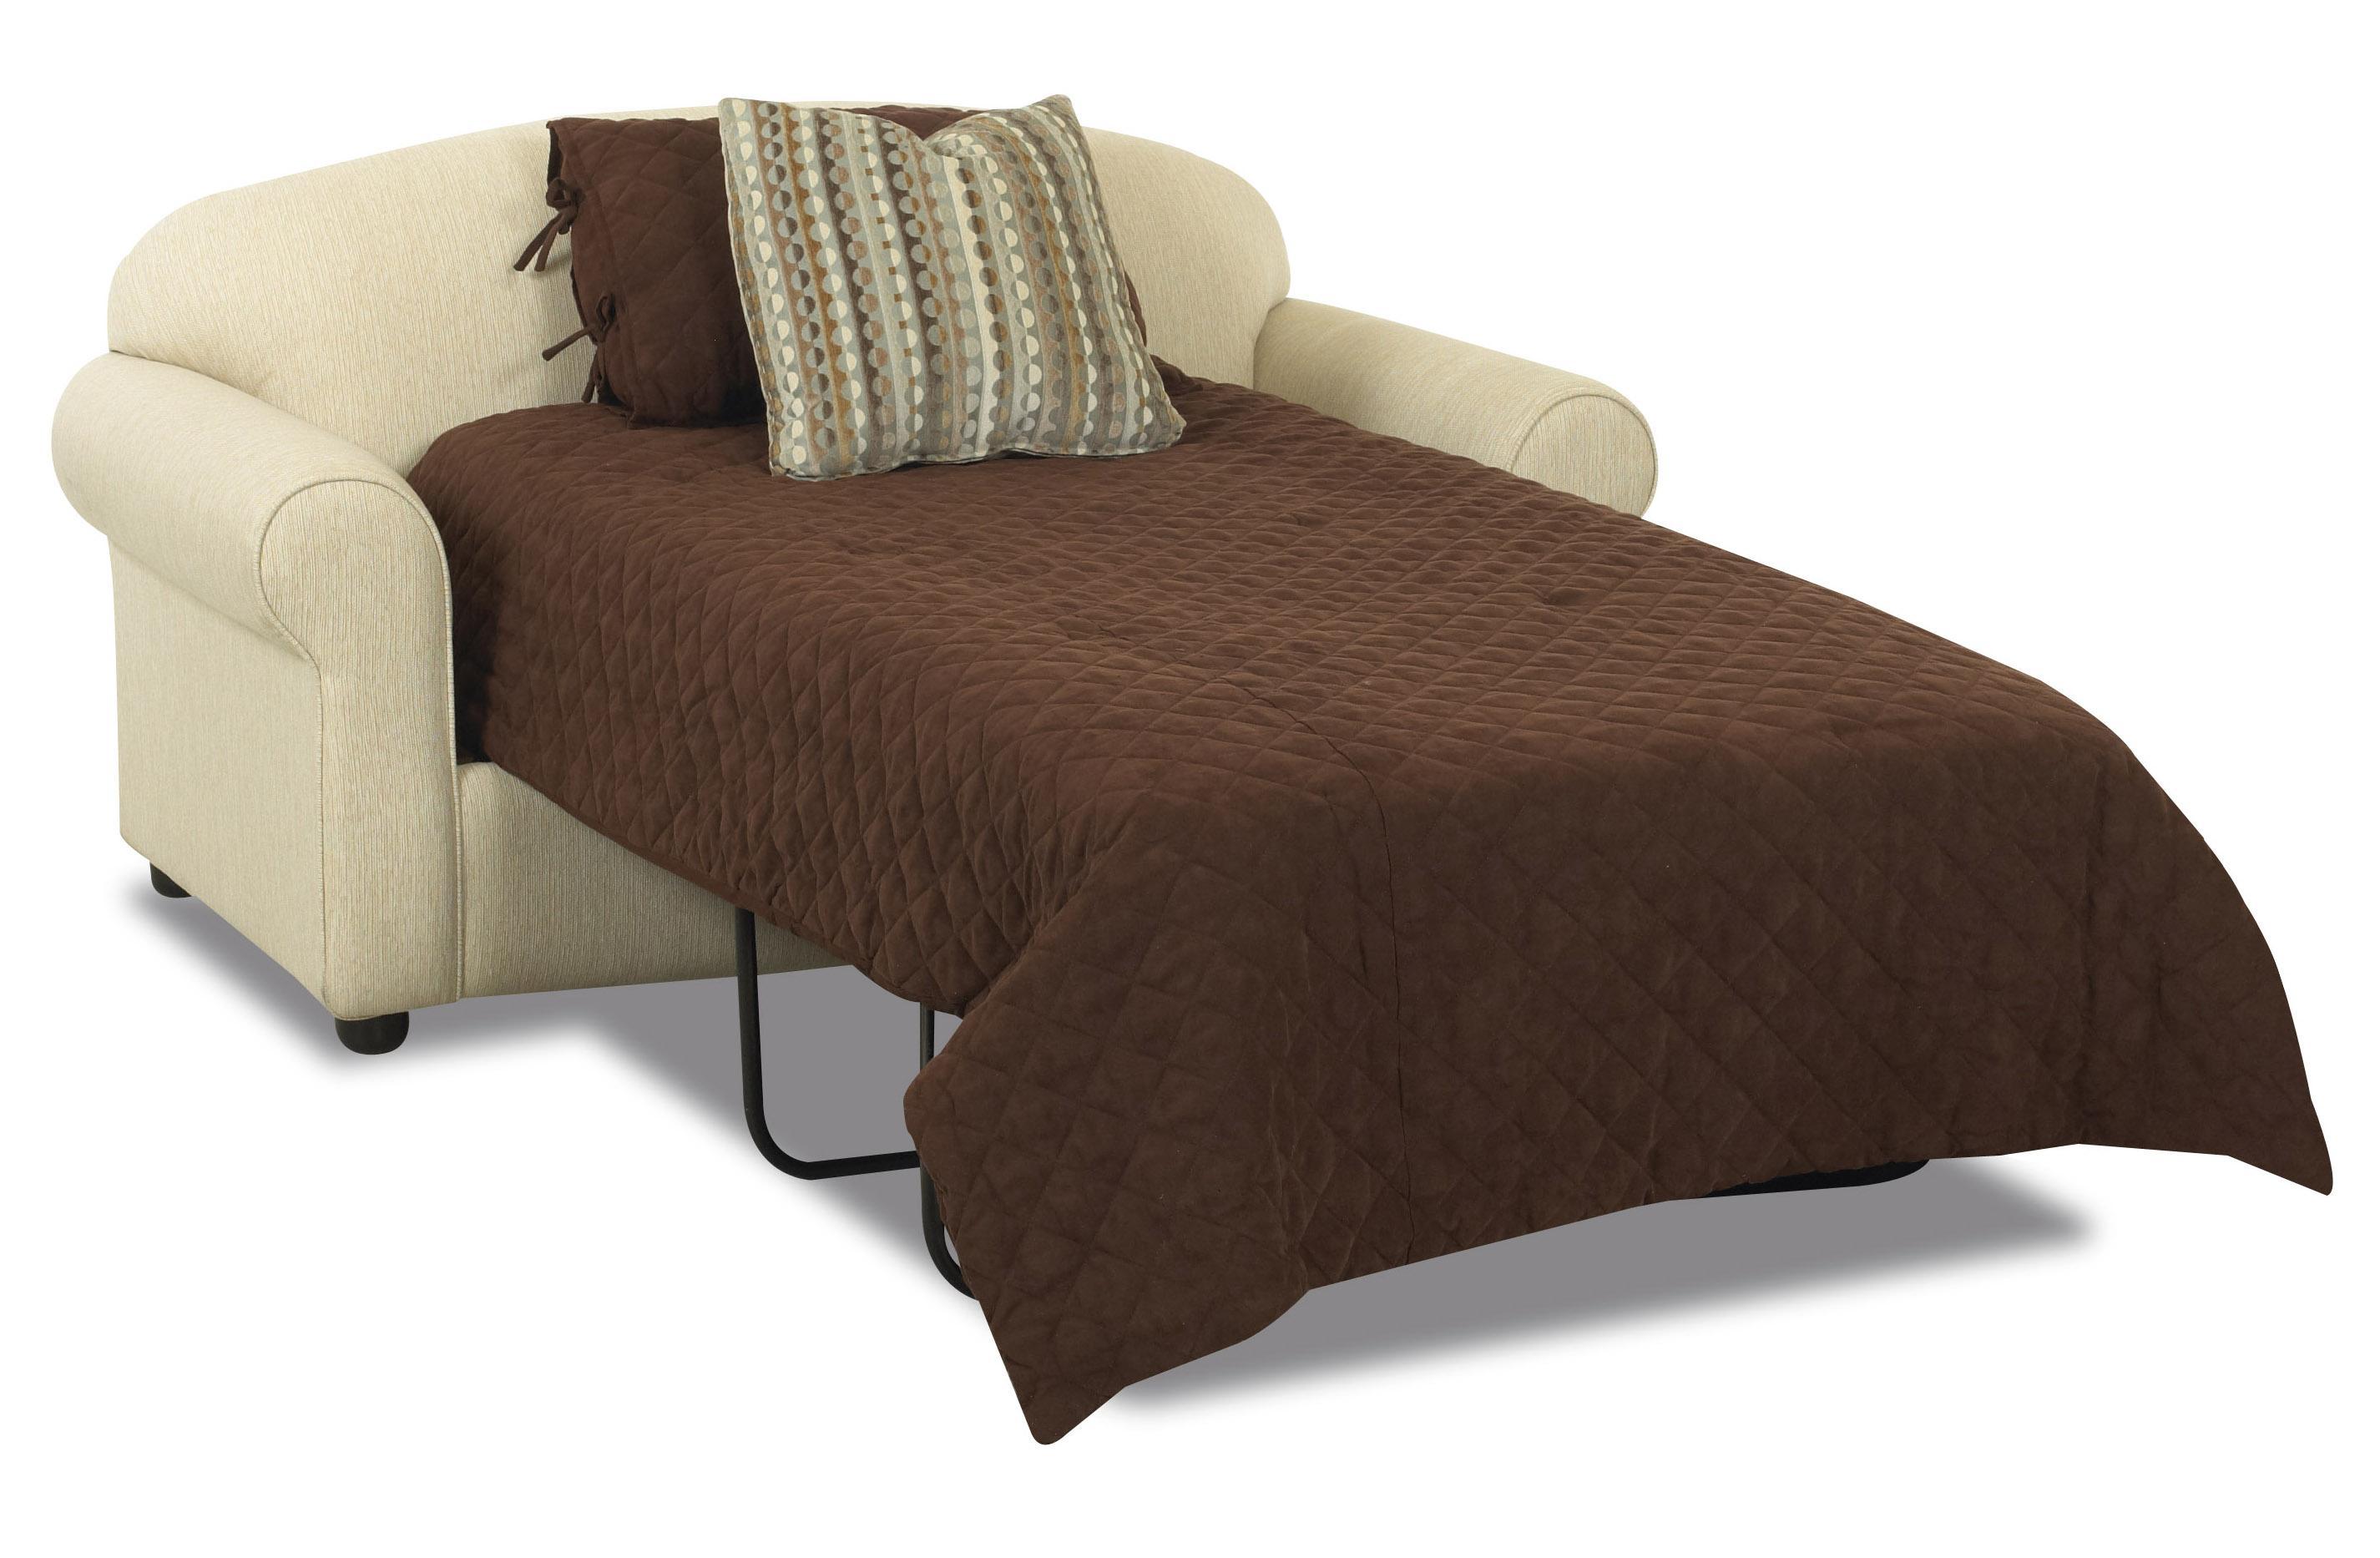 Modern Klaussner Possibilities Twin Sleeper Sofa - Item Number: 500ITSLP loveseat sleeper sofa